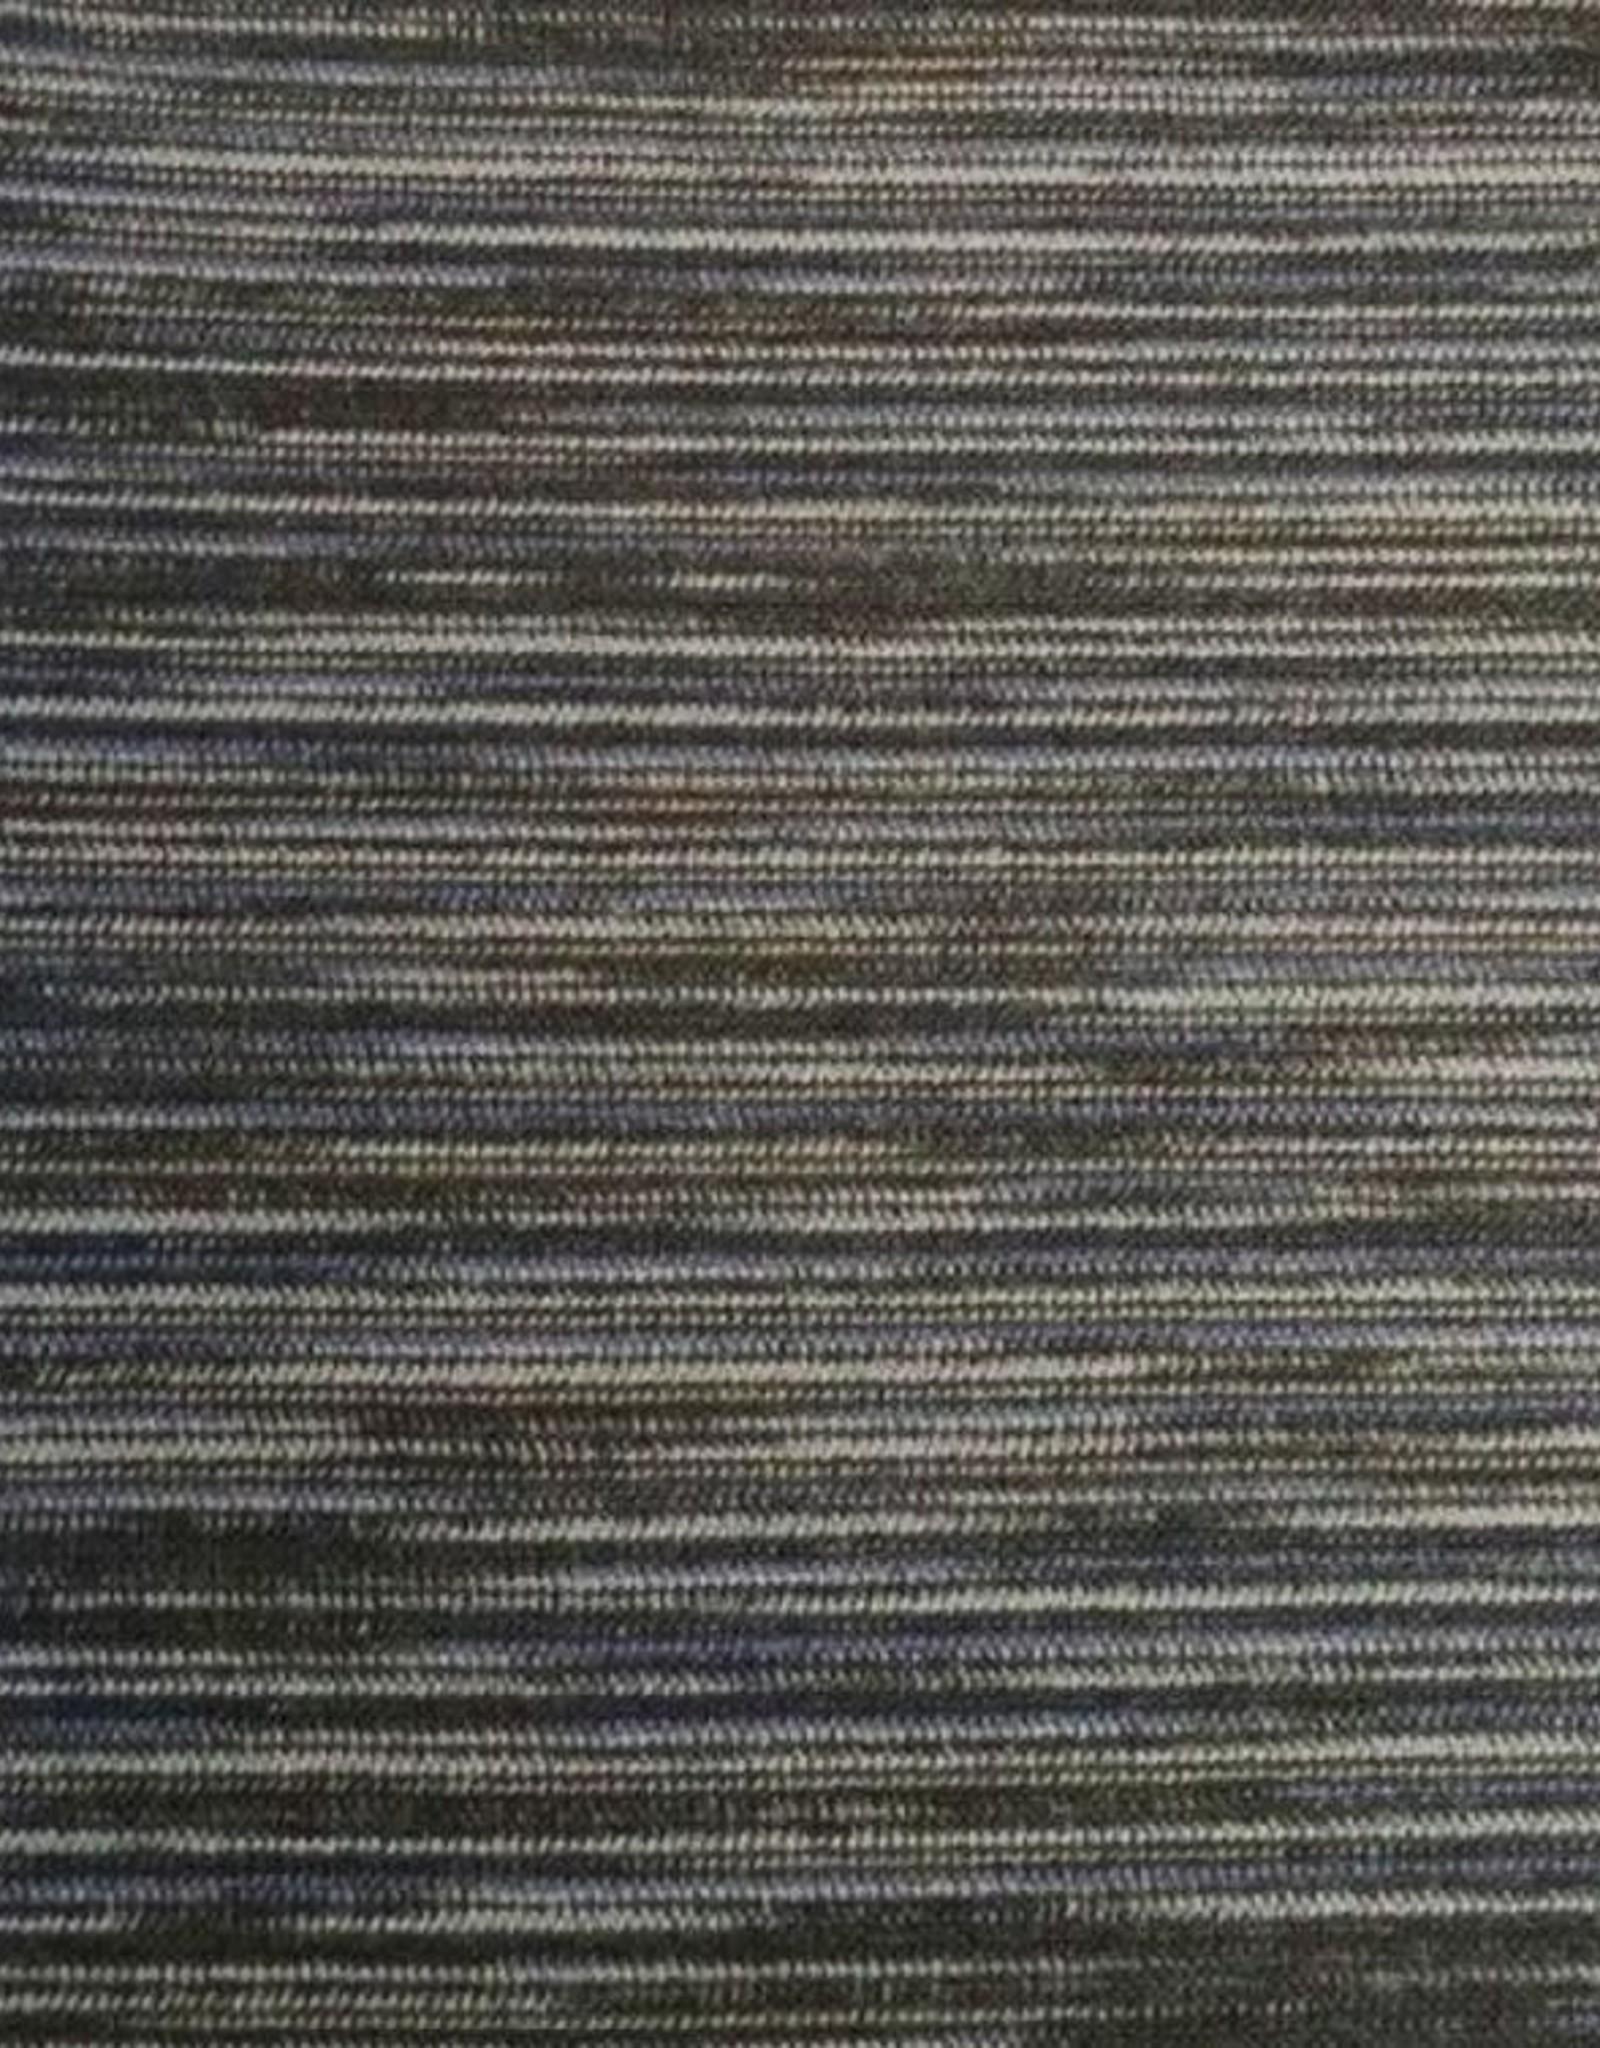 Multi-Striped Leggings in 2 Colors